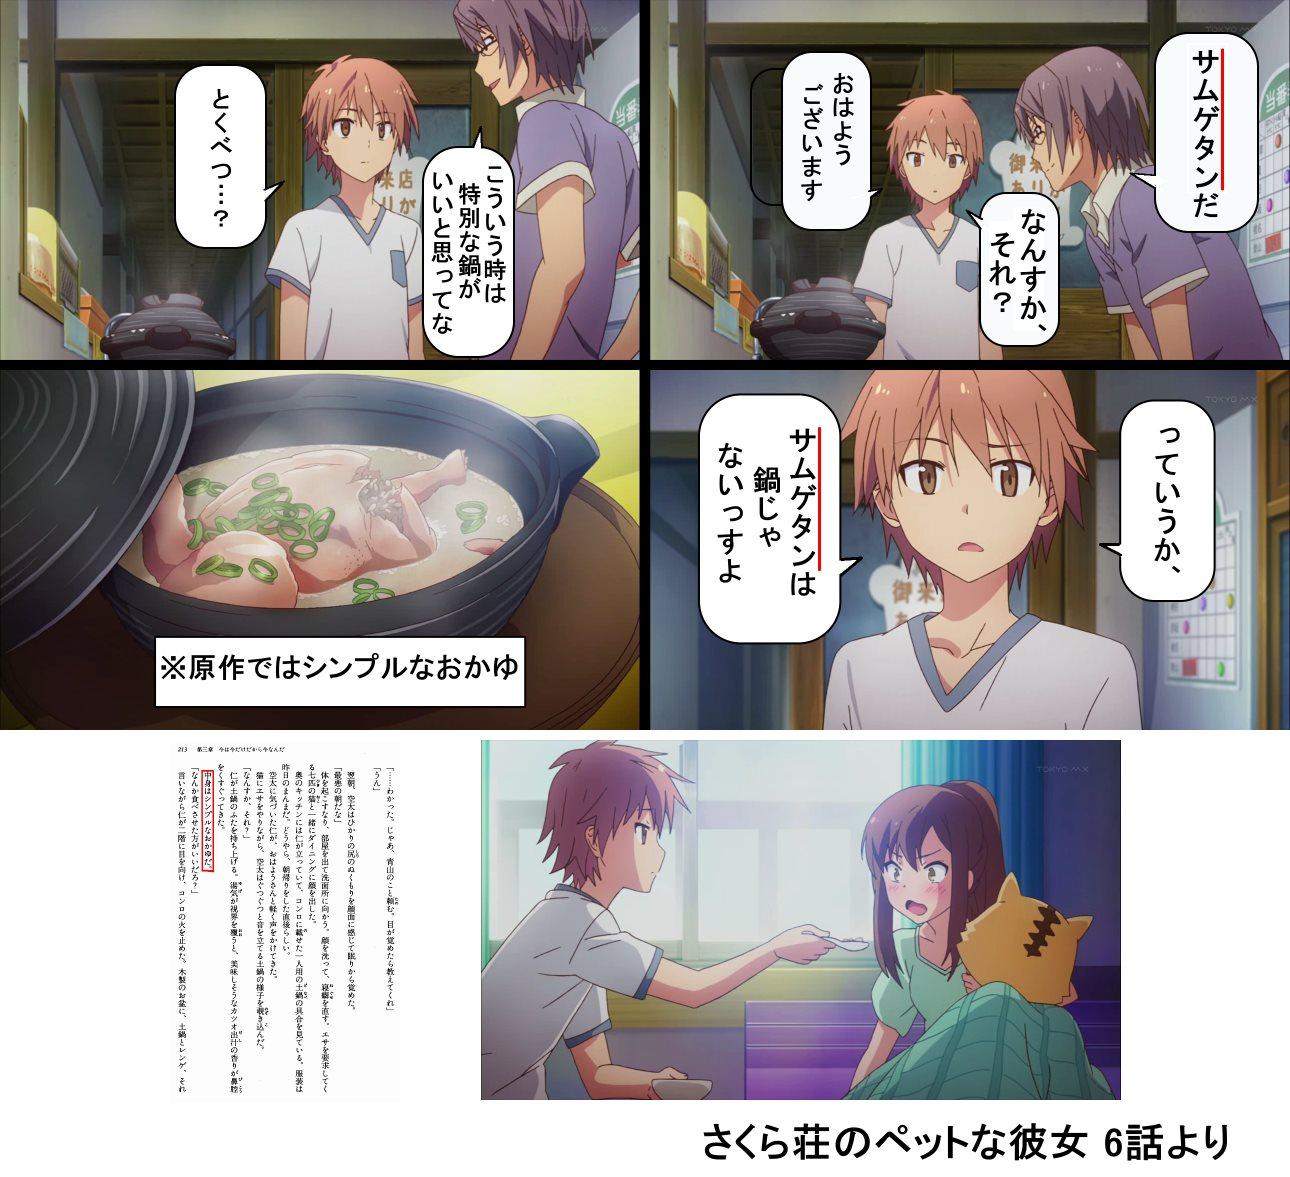 http://blog-imgs-45.fc2.com/a/n/k/ankosokuho/1352715769.jpg